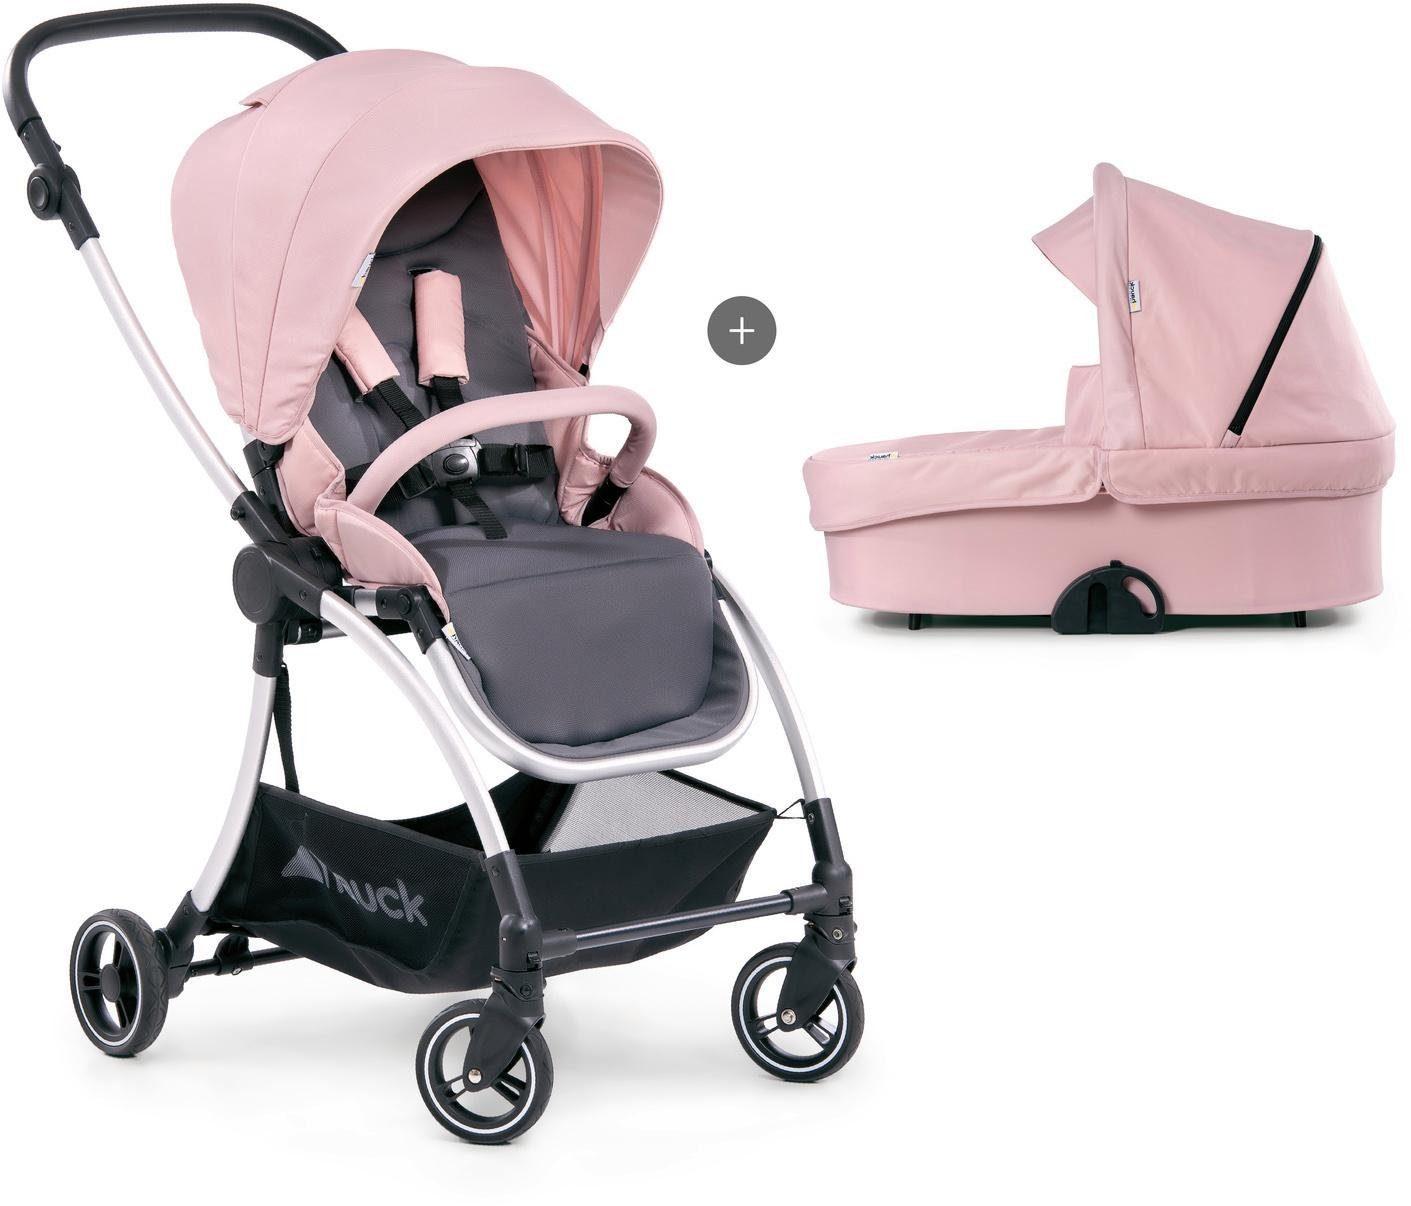 "Hauck Kombi-Kinderwagen ""Eagle 4S Duoset pink/grey"" Kindermode/Ausstattung/Kinderwagen & Buggies/Kinderwagen/Kombikinderwagen"